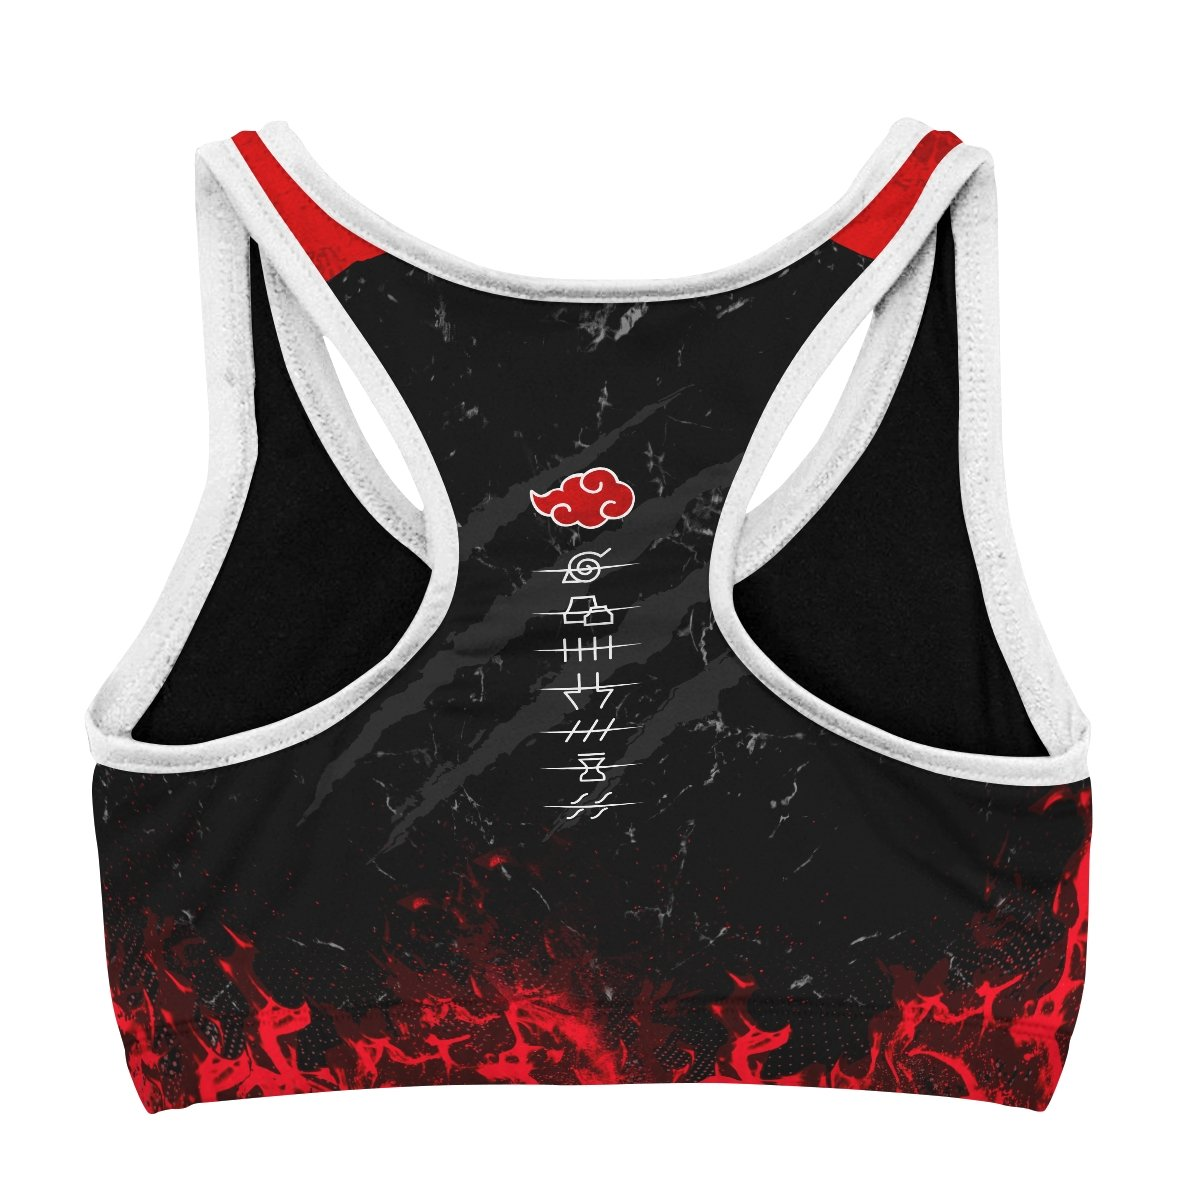 naruto akatsuki pride active wear set 145372 - Anime Swimsuits